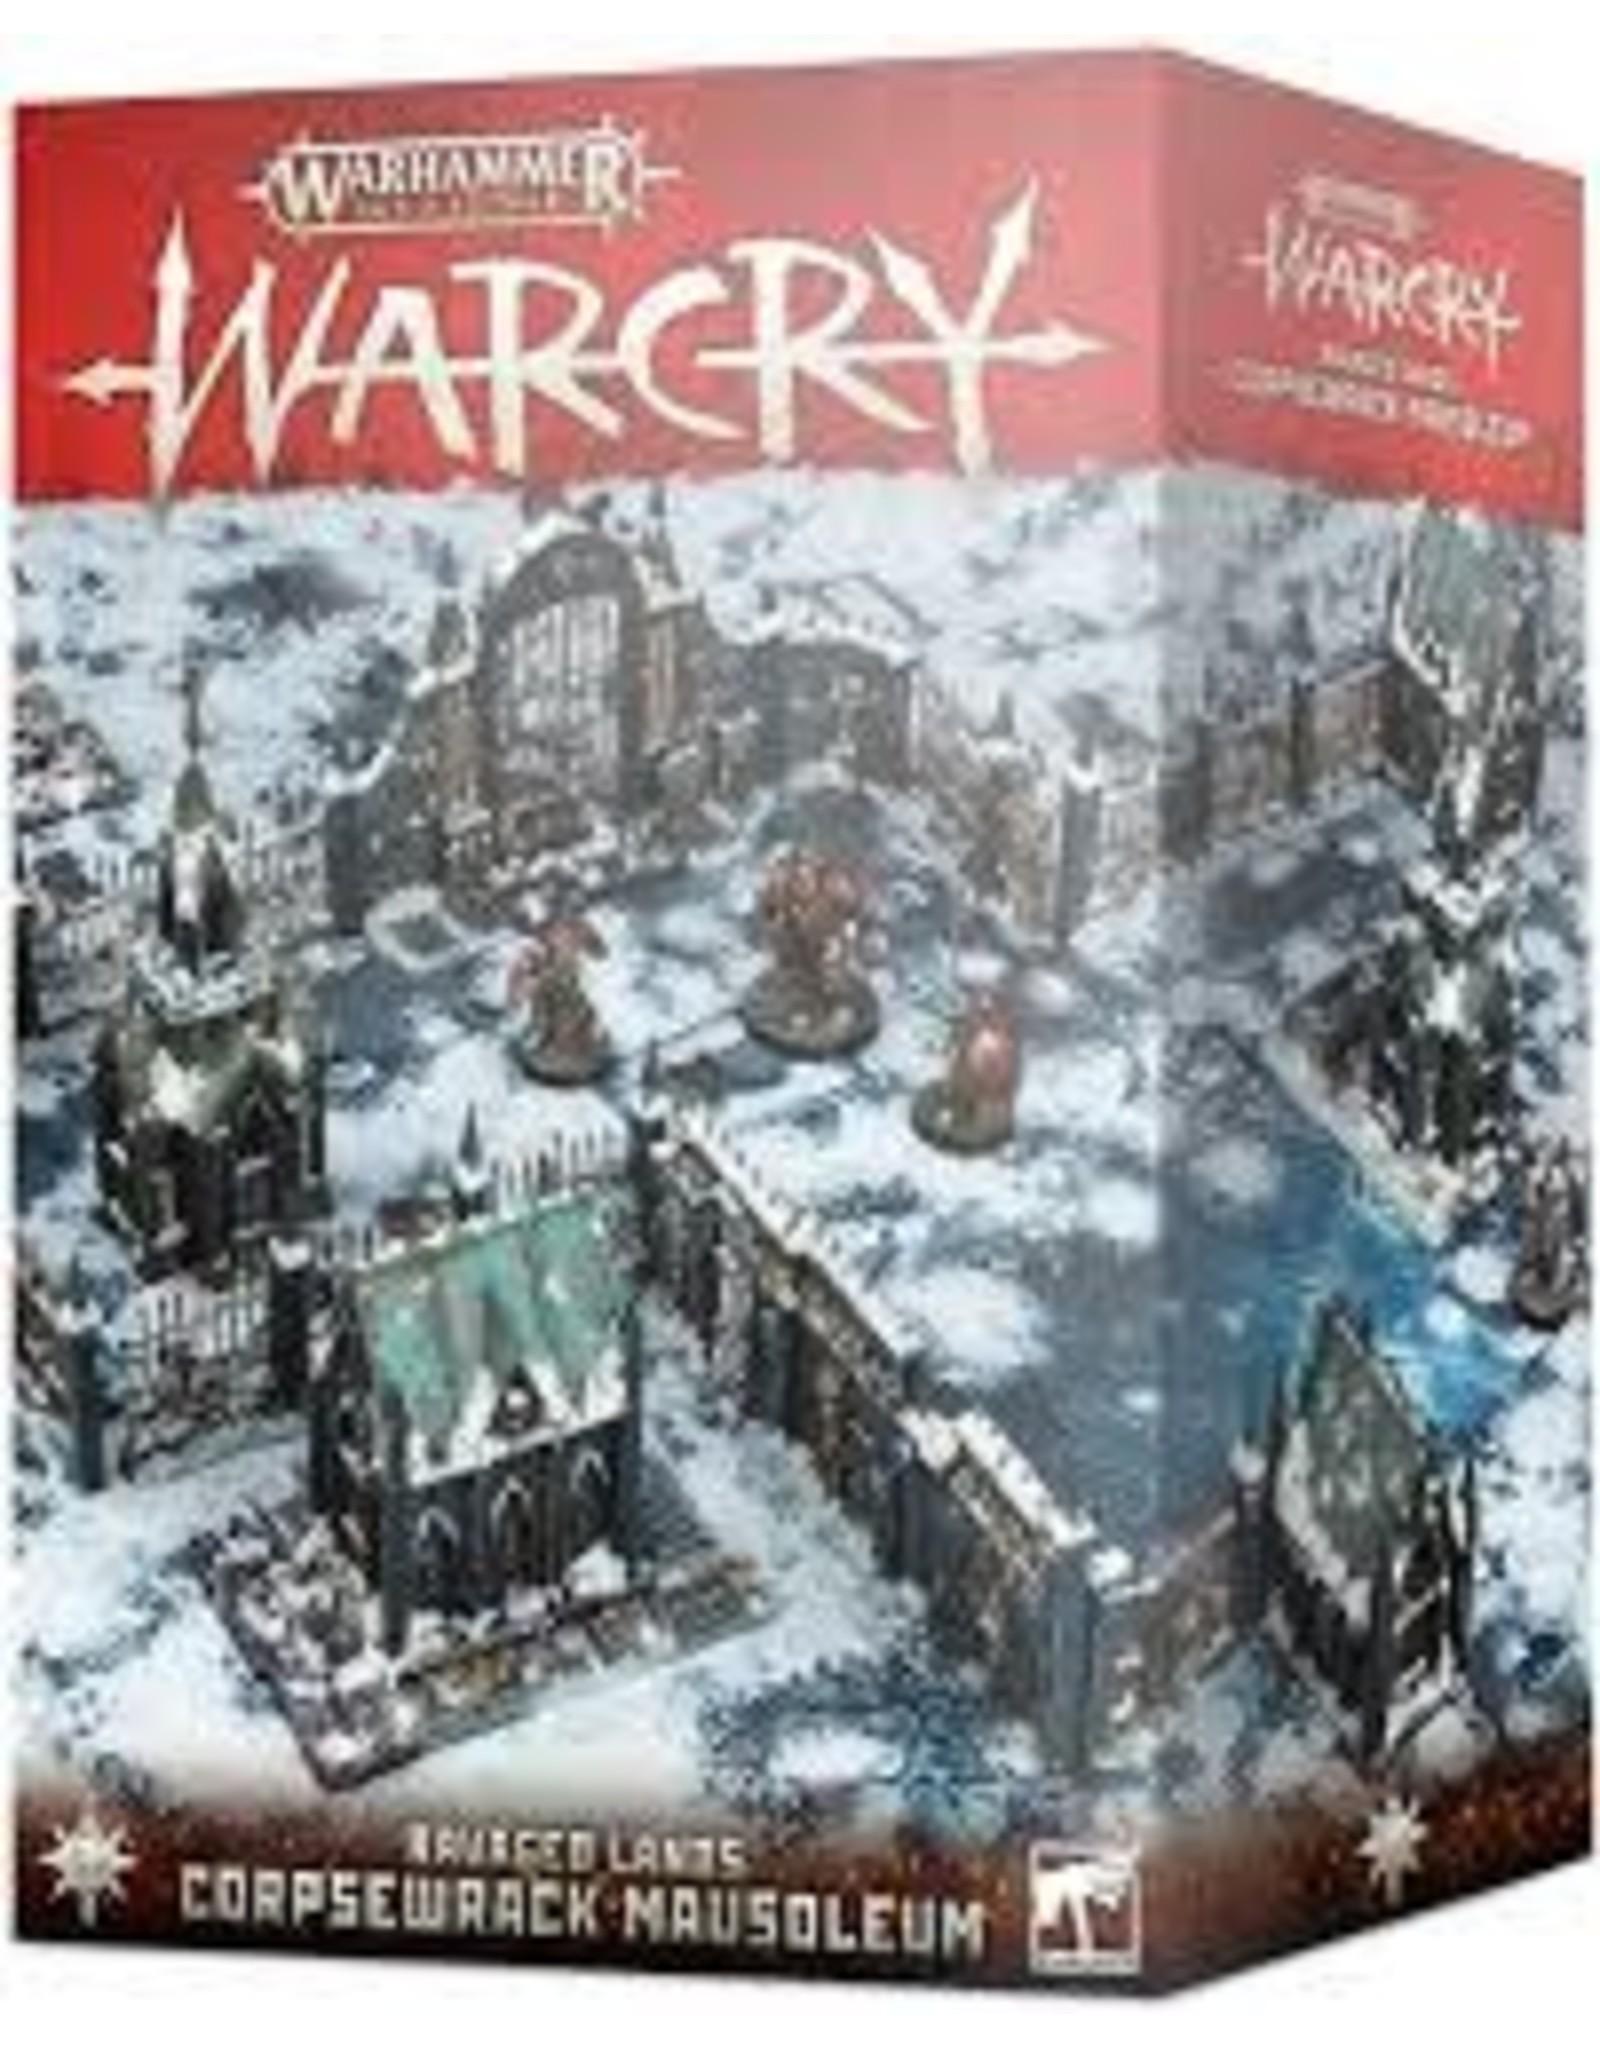 AoS Warcry: Corpsewrack Mausoleum